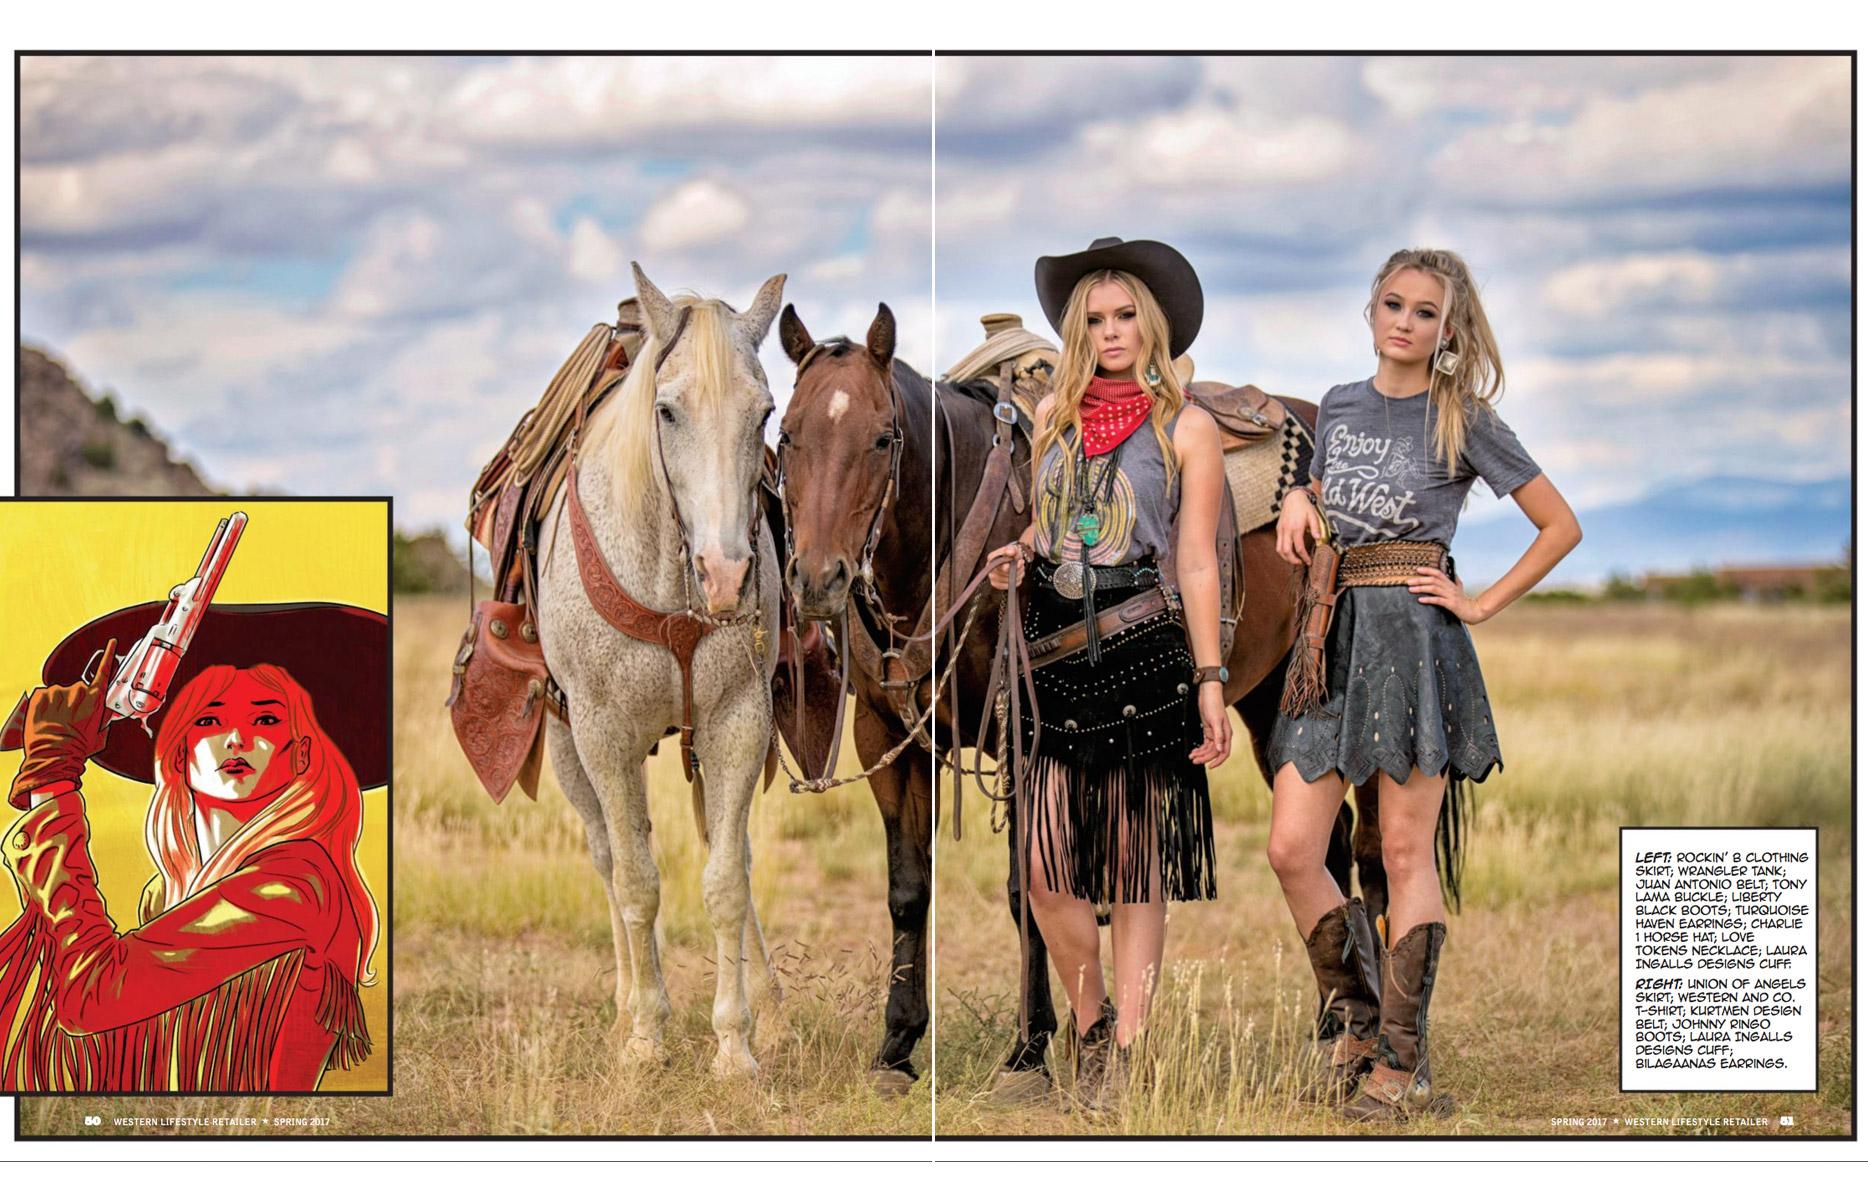 western-lifetslye-3.jpg